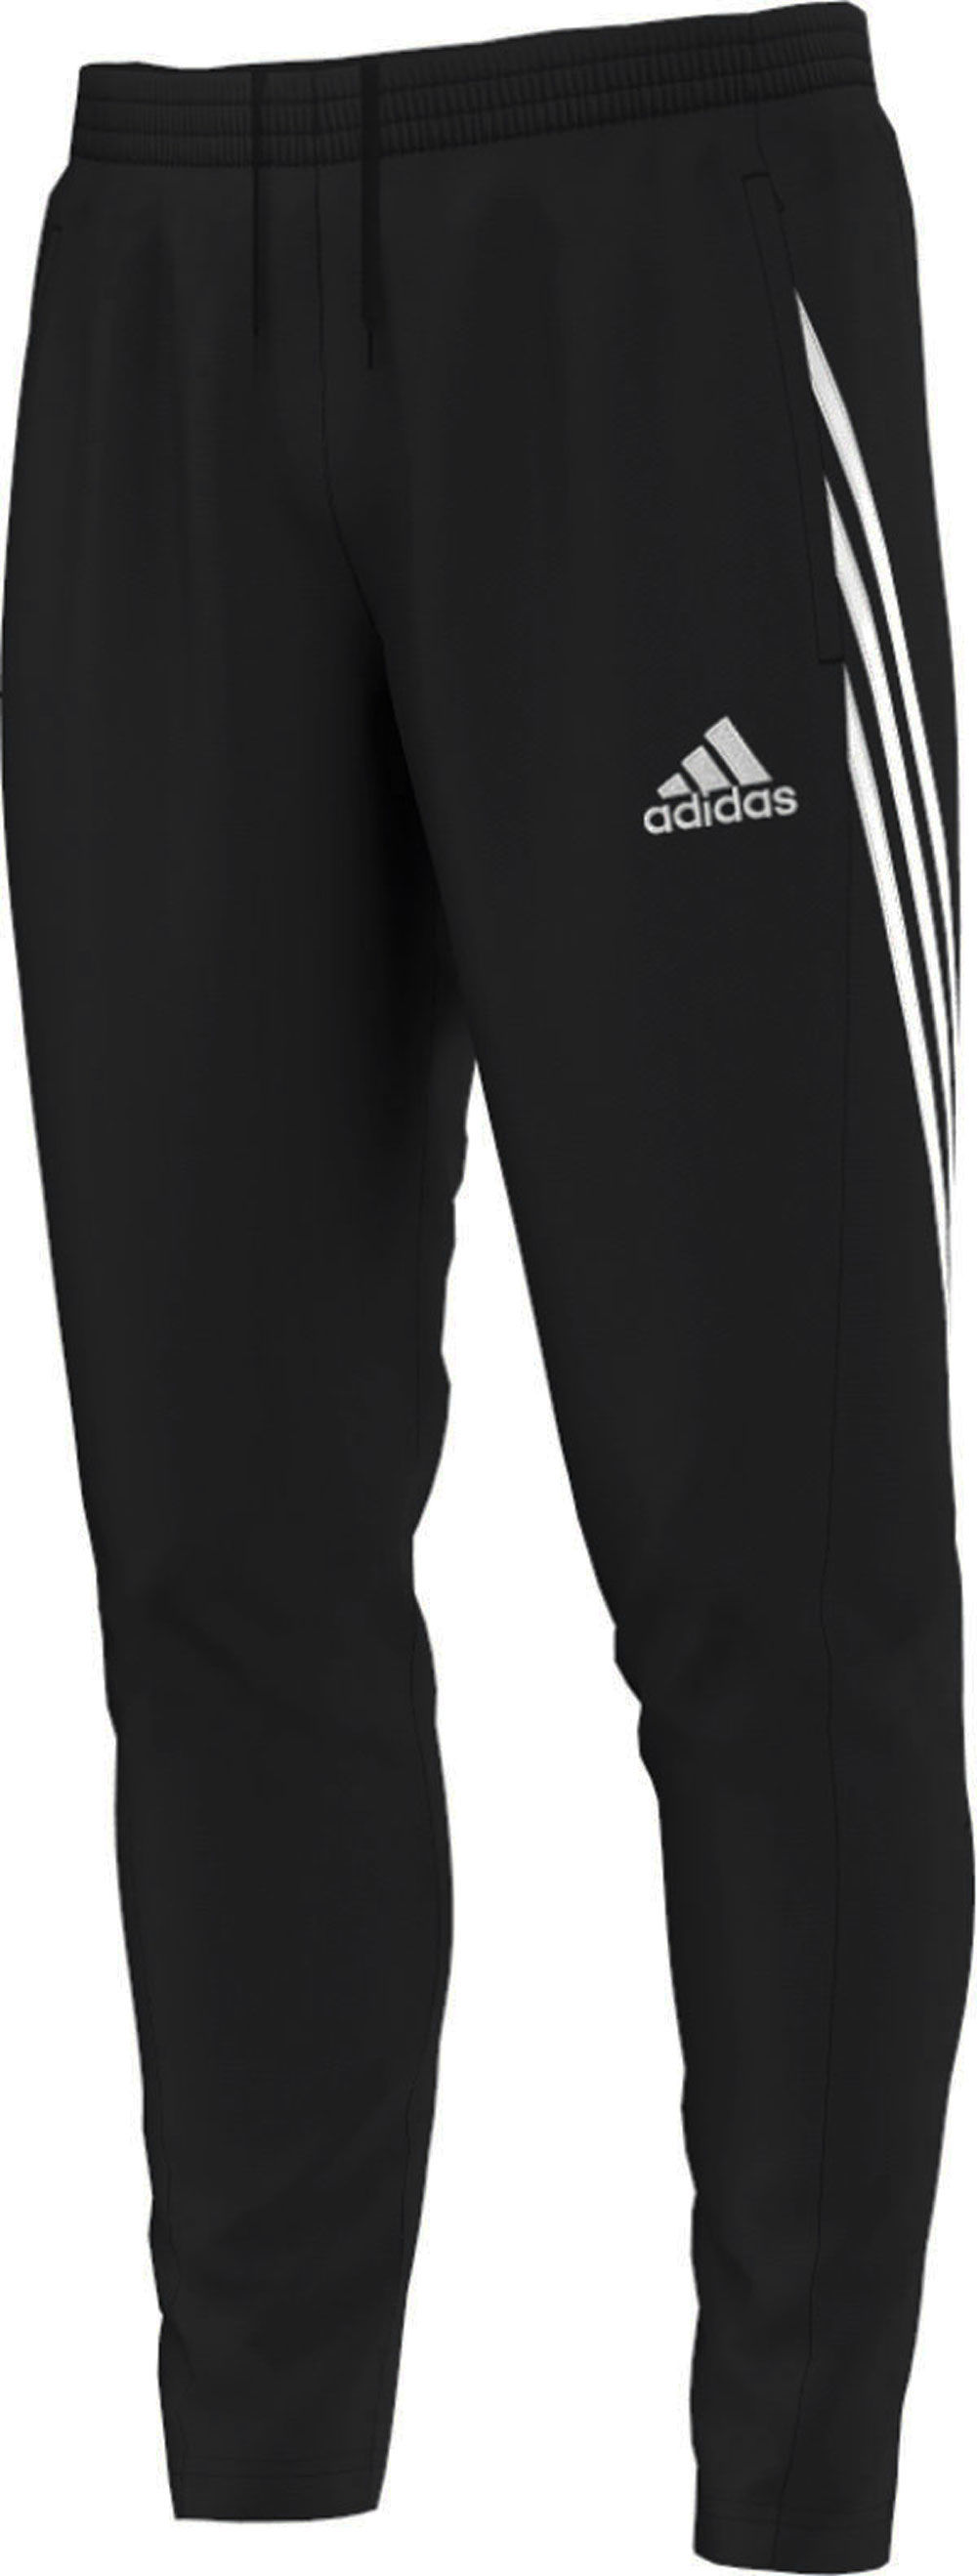 Adidas Sere14 Trg Pant lasten verryttelyhousut Musta 9484c5e646ec